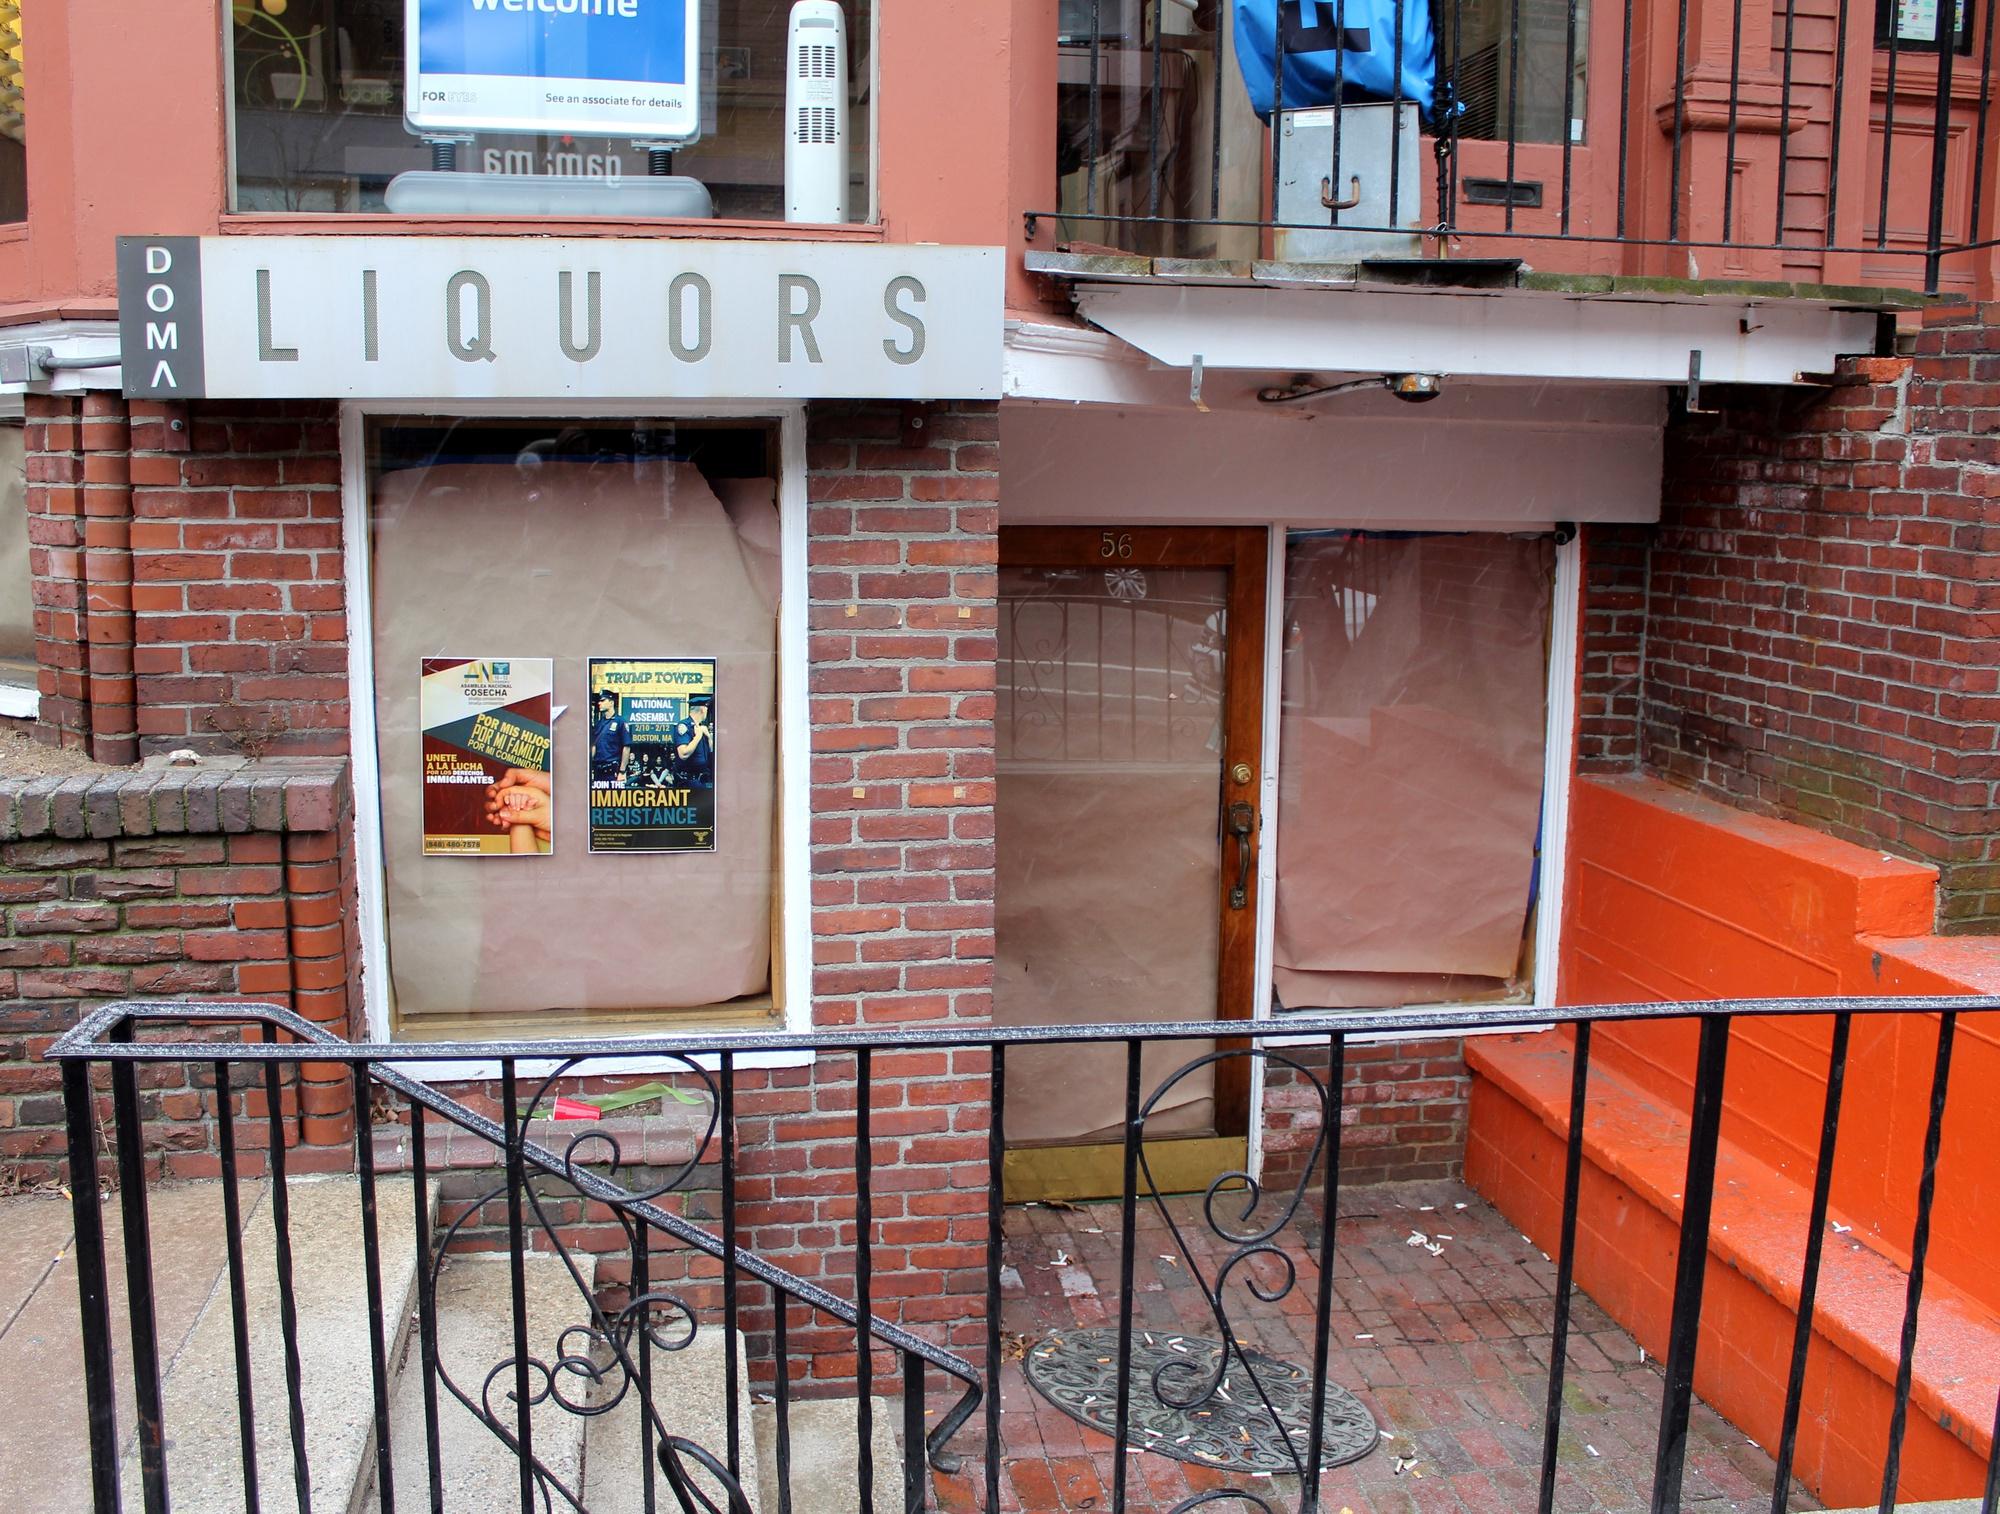 Artisanal Gelato Maker, Amorino Gelato, will soon be opening in Harvard Square.